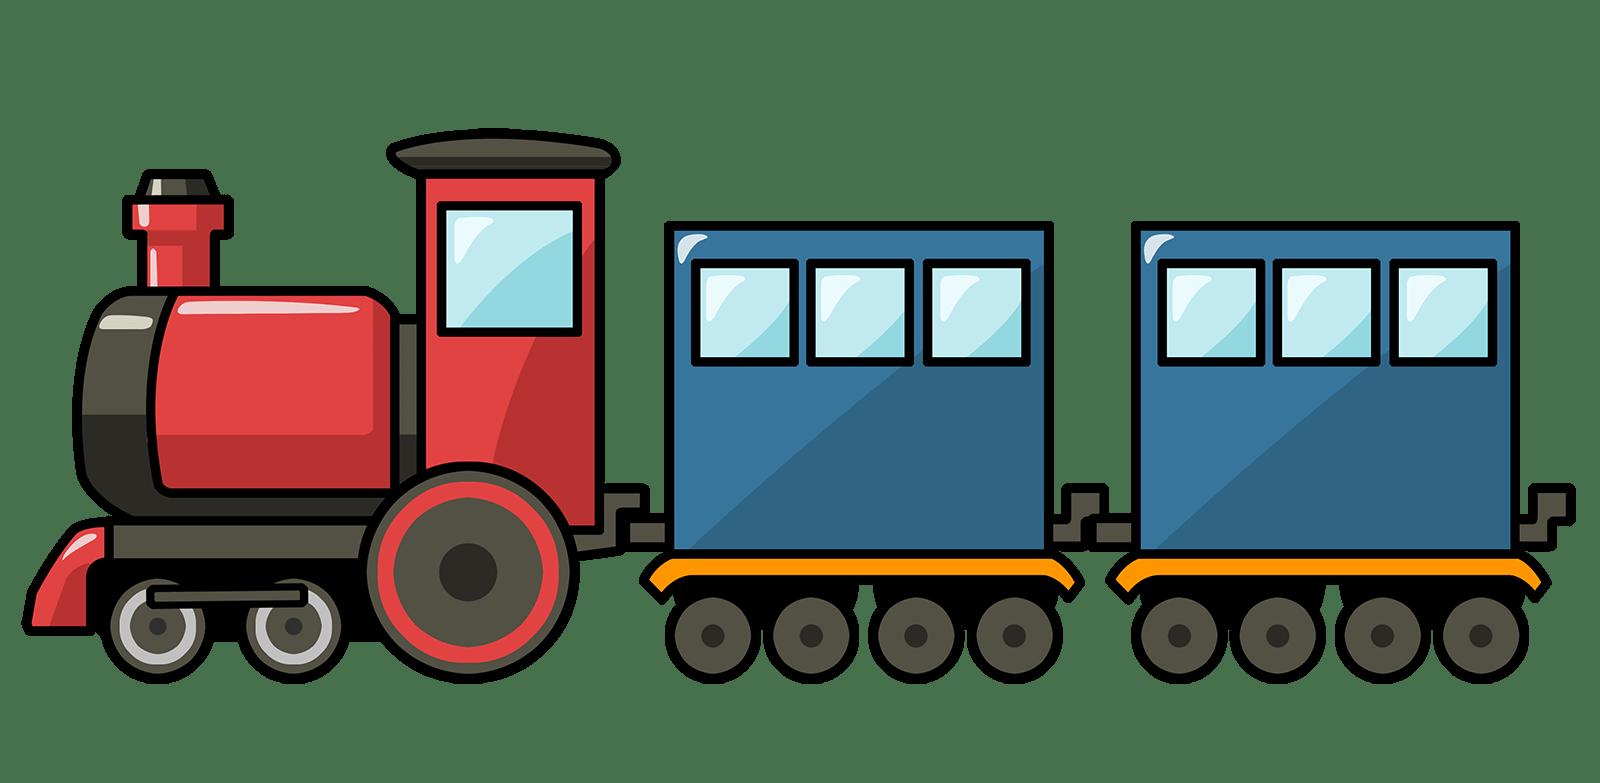 Steam locomotive silhouette at. Steampunk clipart train